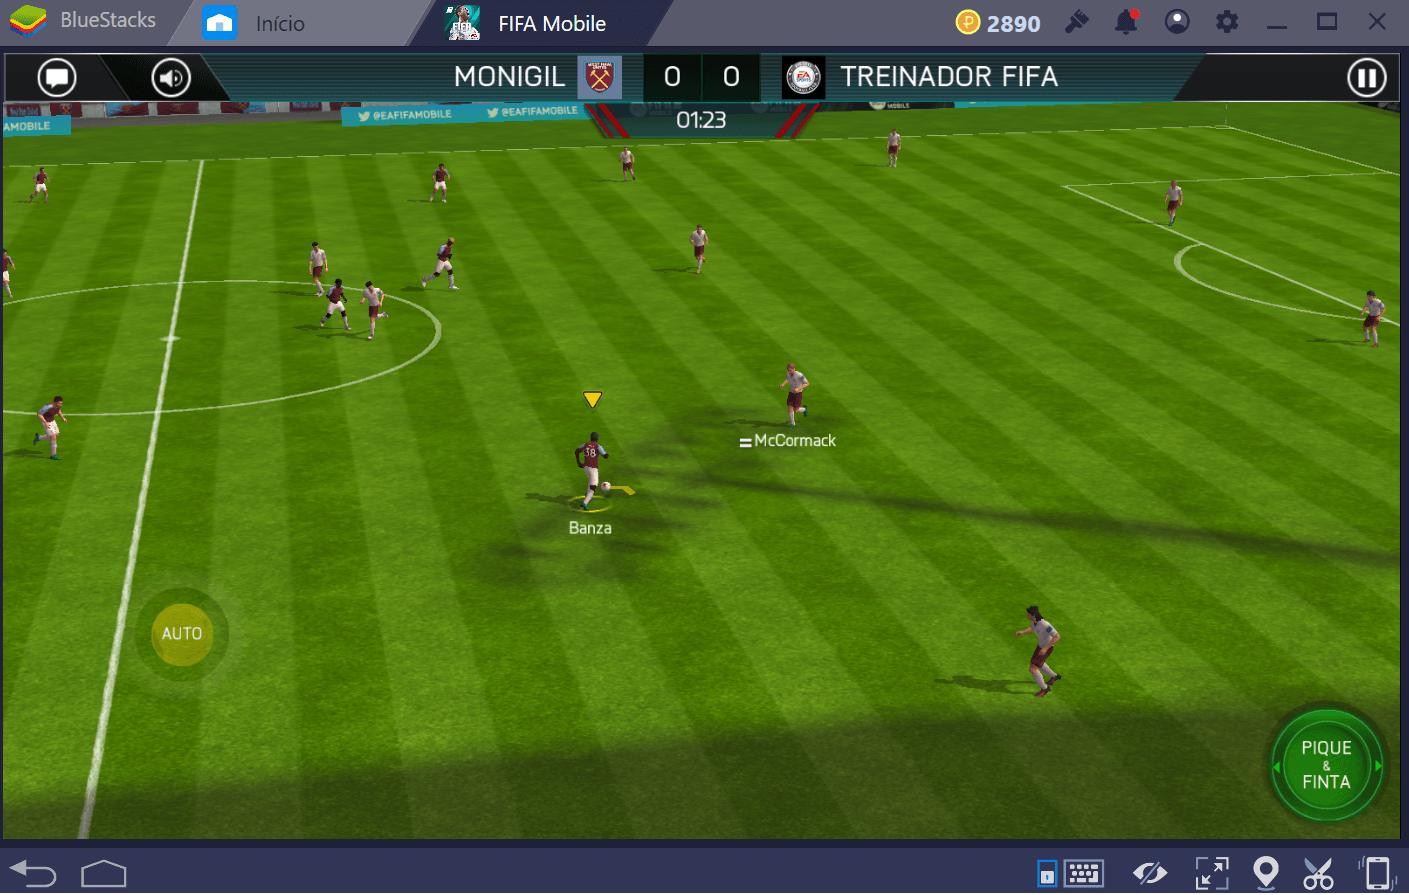 Dicas gerais para Futebol FIFA: FIFA World Cup (FIFA Mobile)